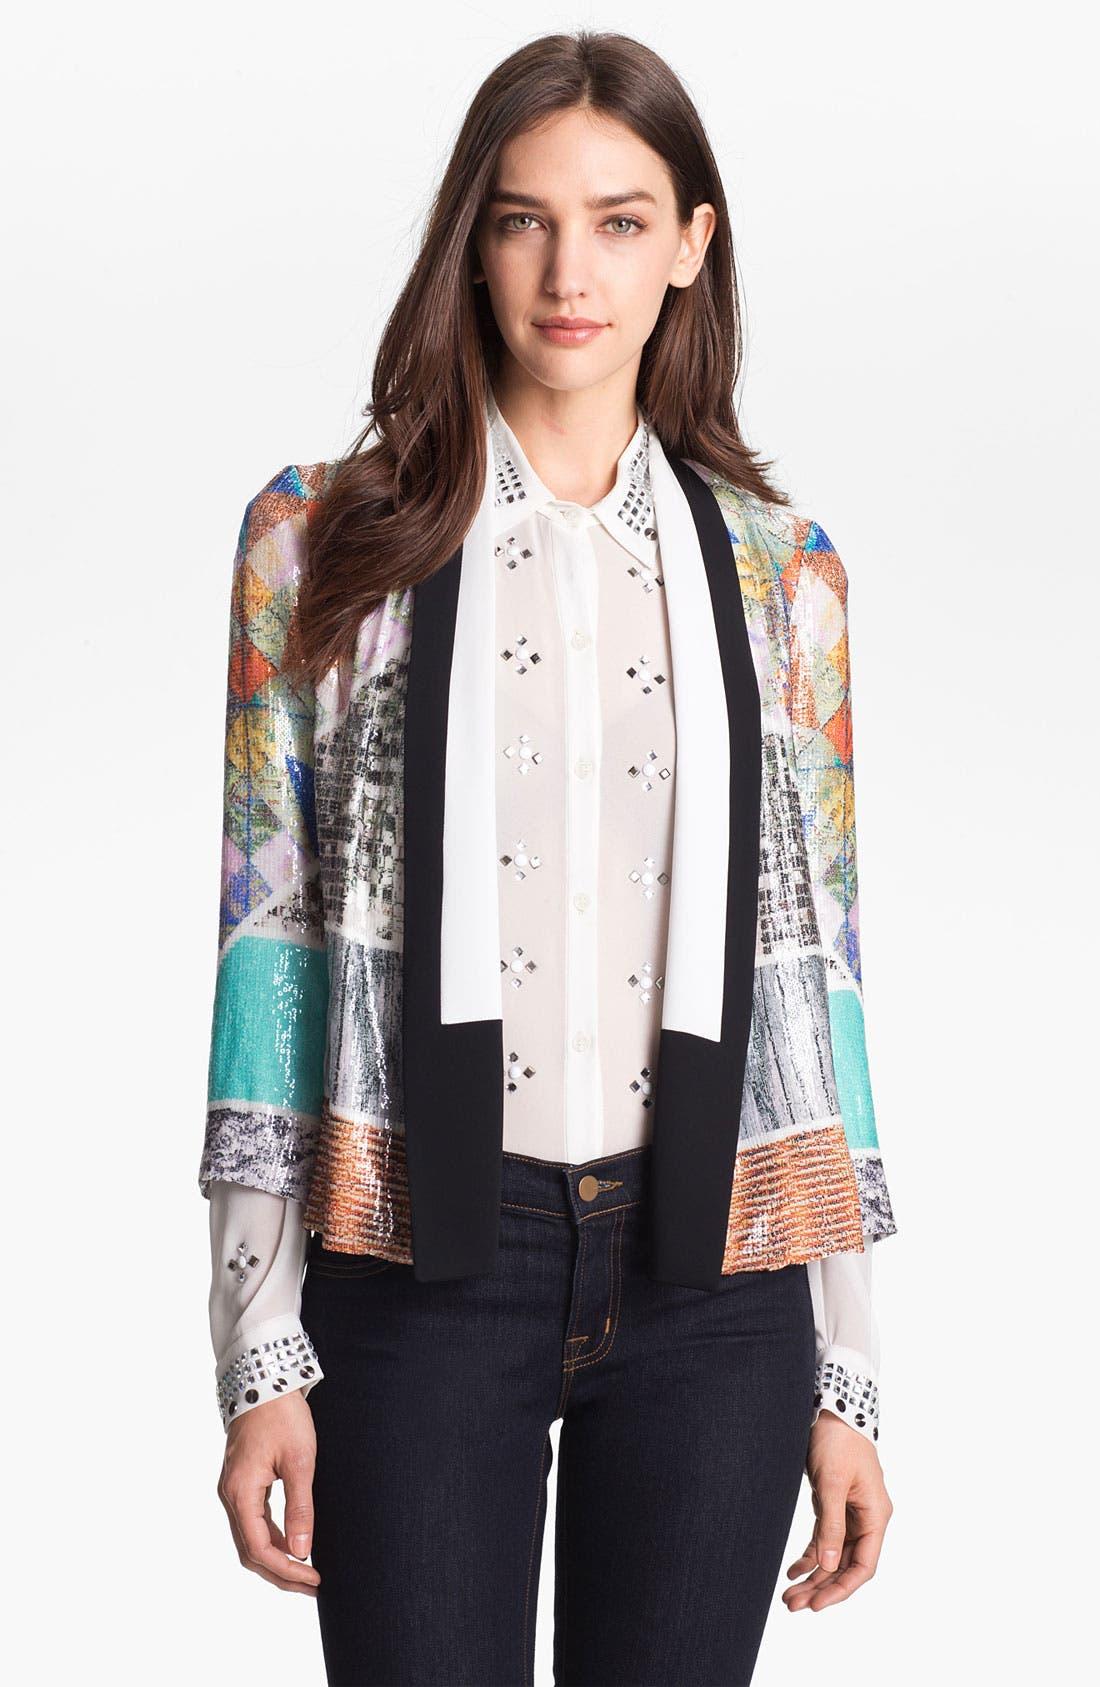 Alternate Image 1 Selected - Clover Canyon 'Roadside Quilt' Sequin Jacket